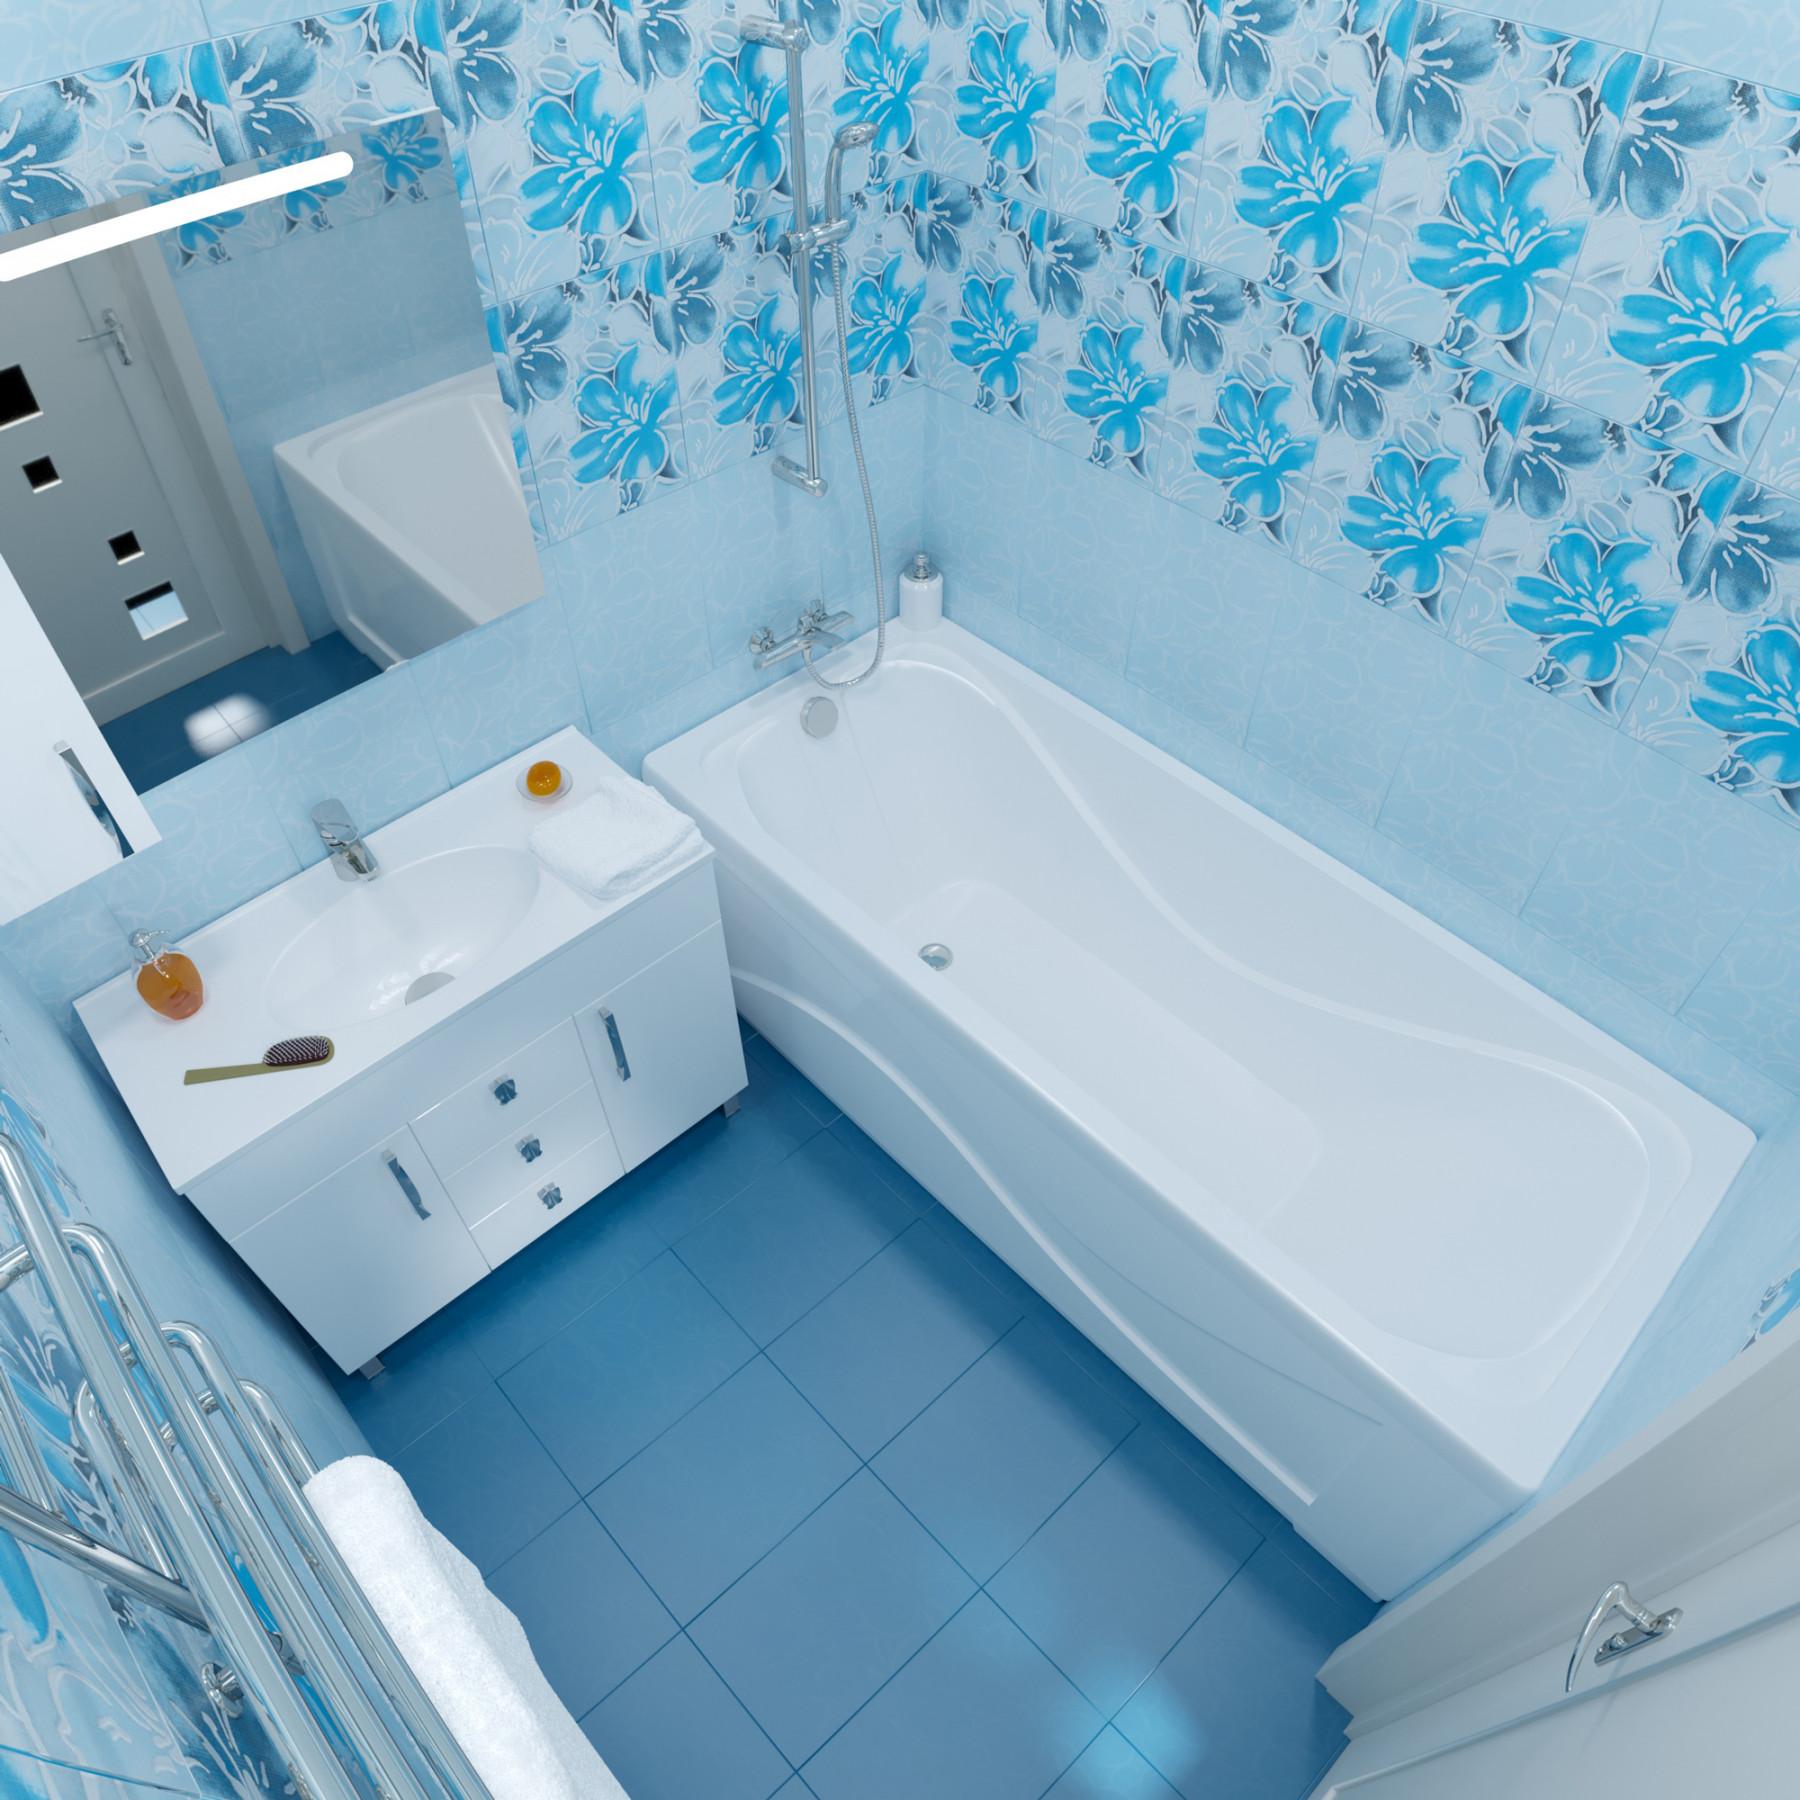 Акриловая ванна Triton Стандарт 170x75